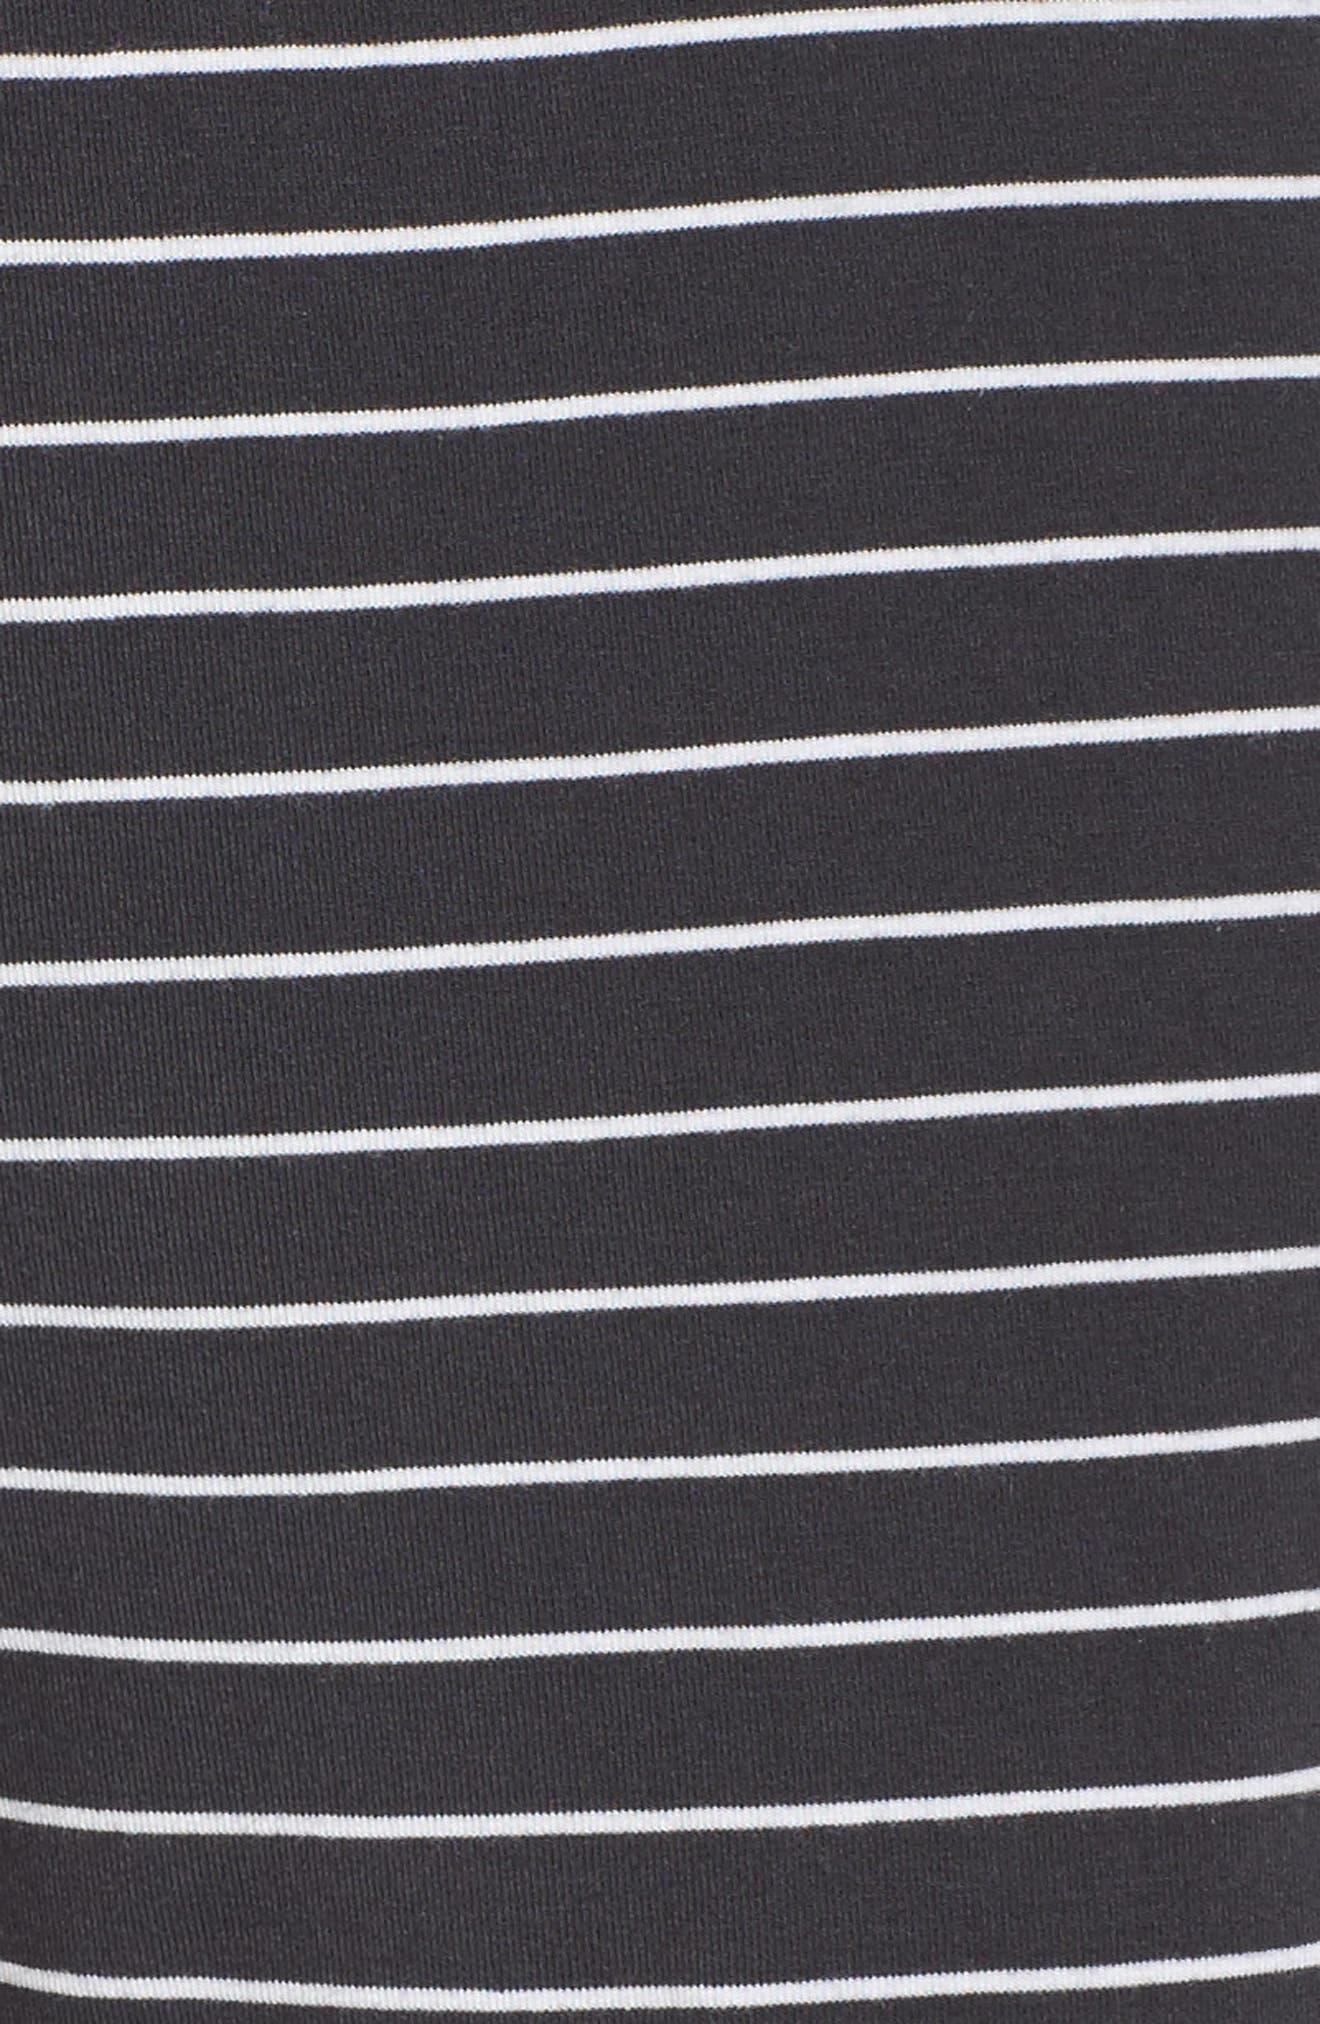 Stripe Jersey Shorts,                             Alternate thumbnail 6, color,                             Smoke